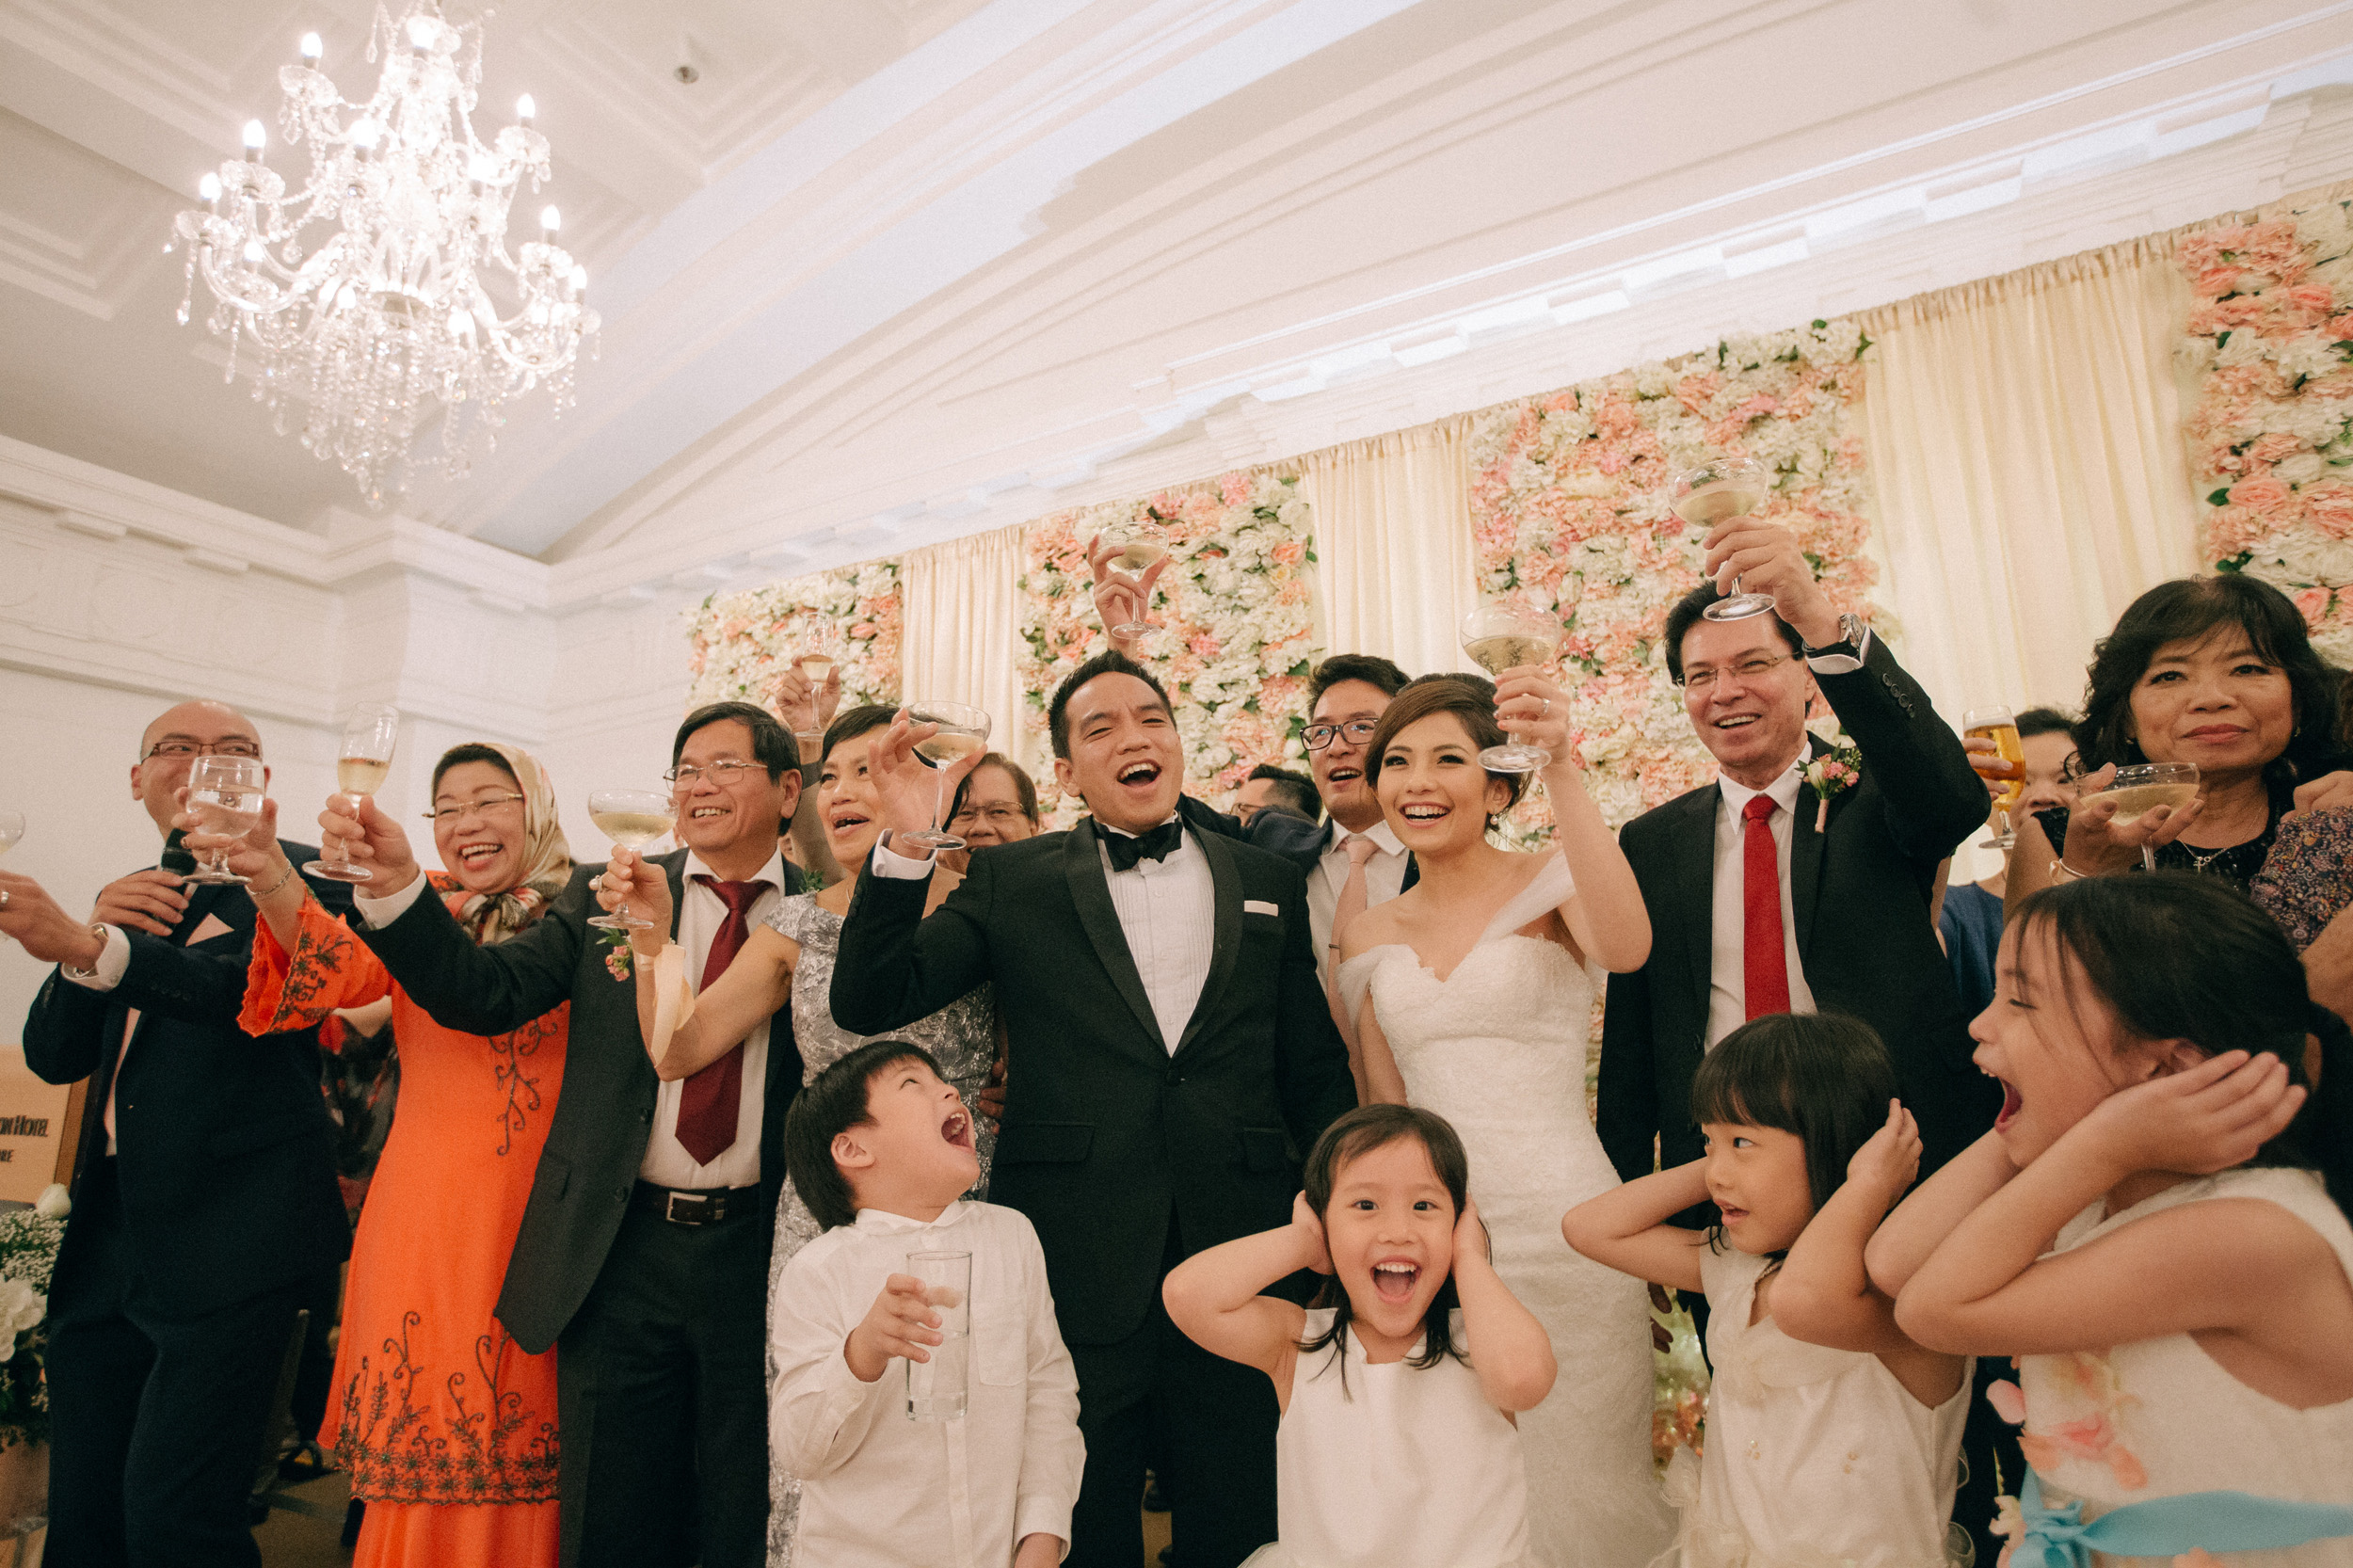 singapore-wedding-photographer-photography-wmt2017-109.jpg